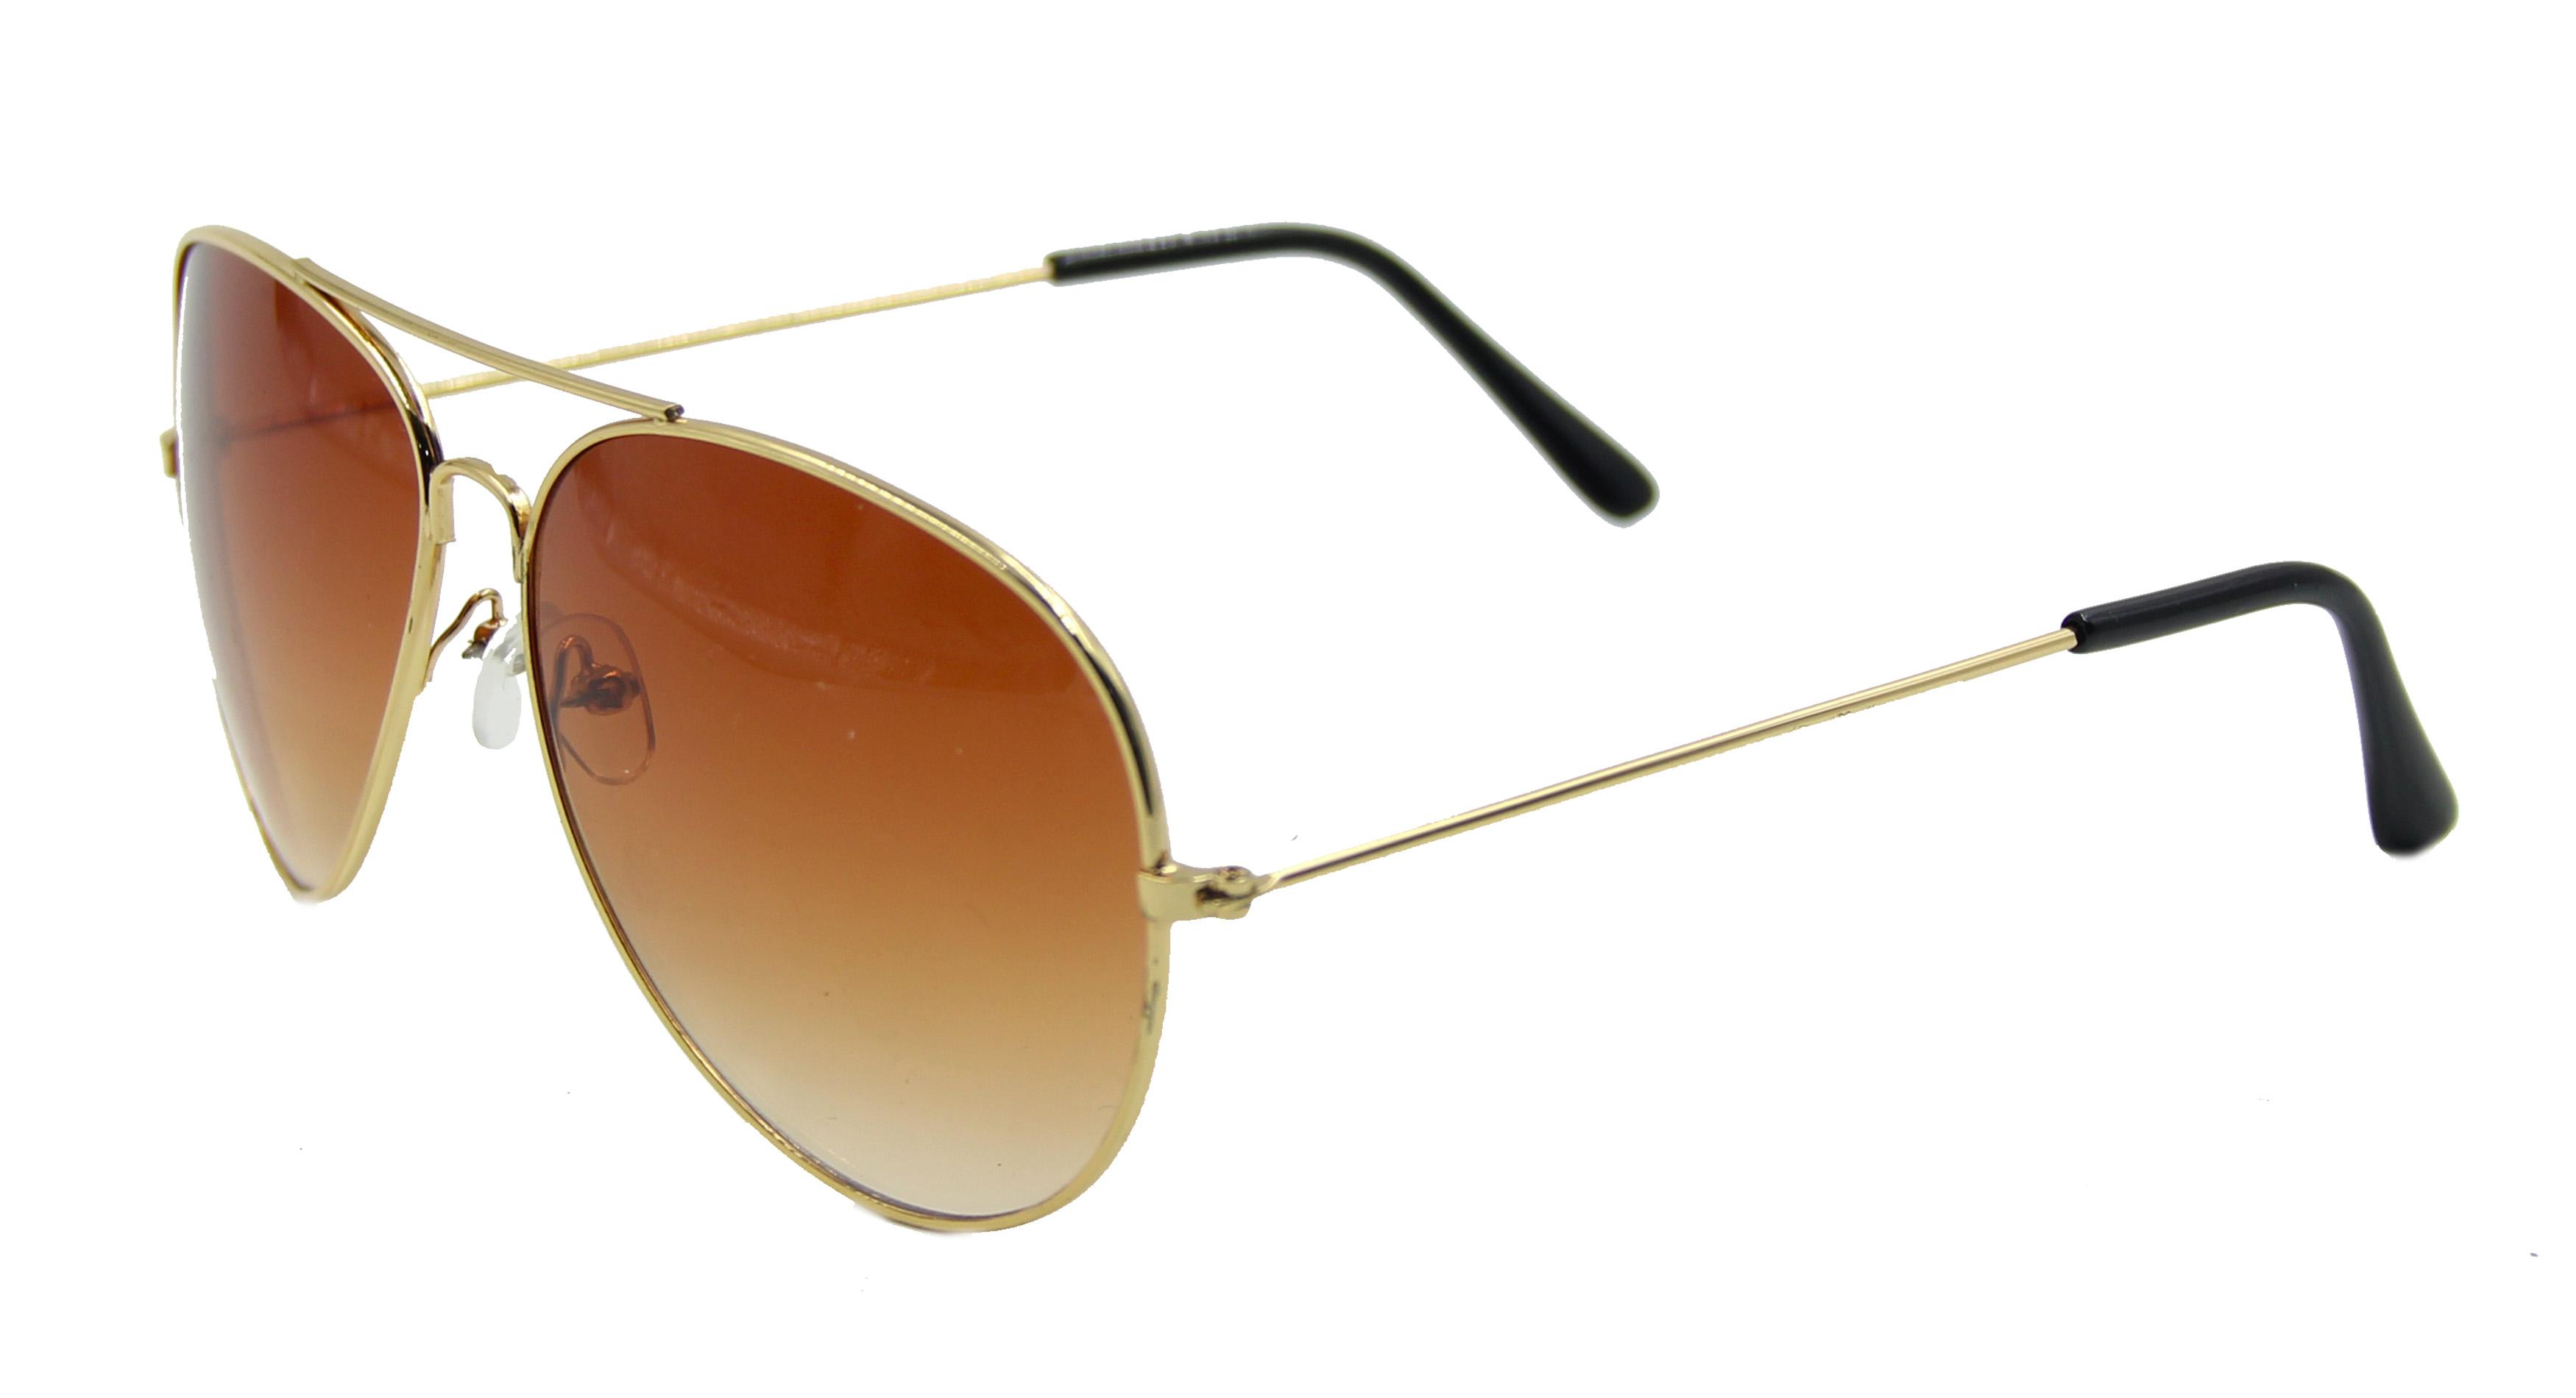 0e059ae9234 Kids Sunglasses Girls Boys Children Mirror Shades UV400 Holiday Fashion  Classic